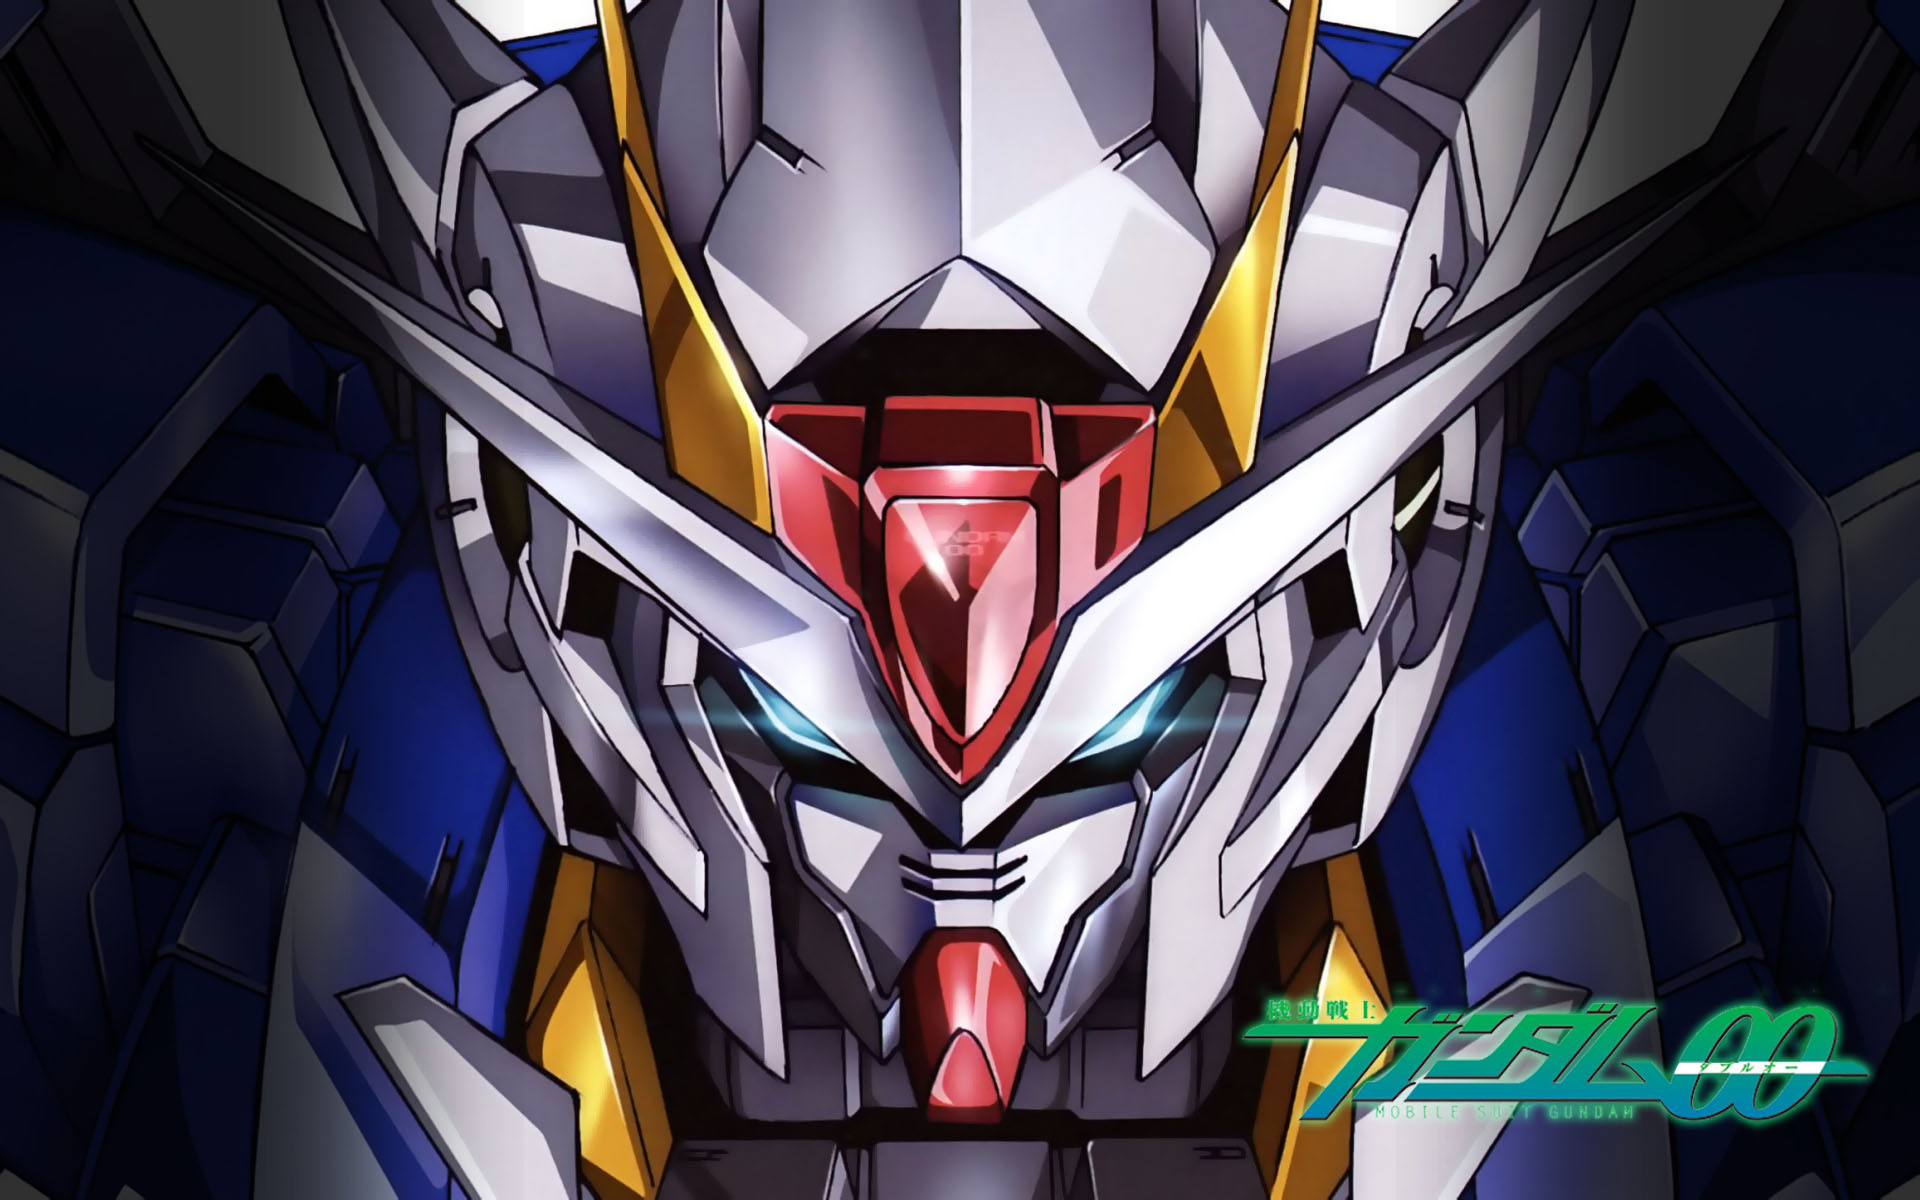 Gundam 00 Wallpaper 1920x1200 Gundam 00 1920x1200